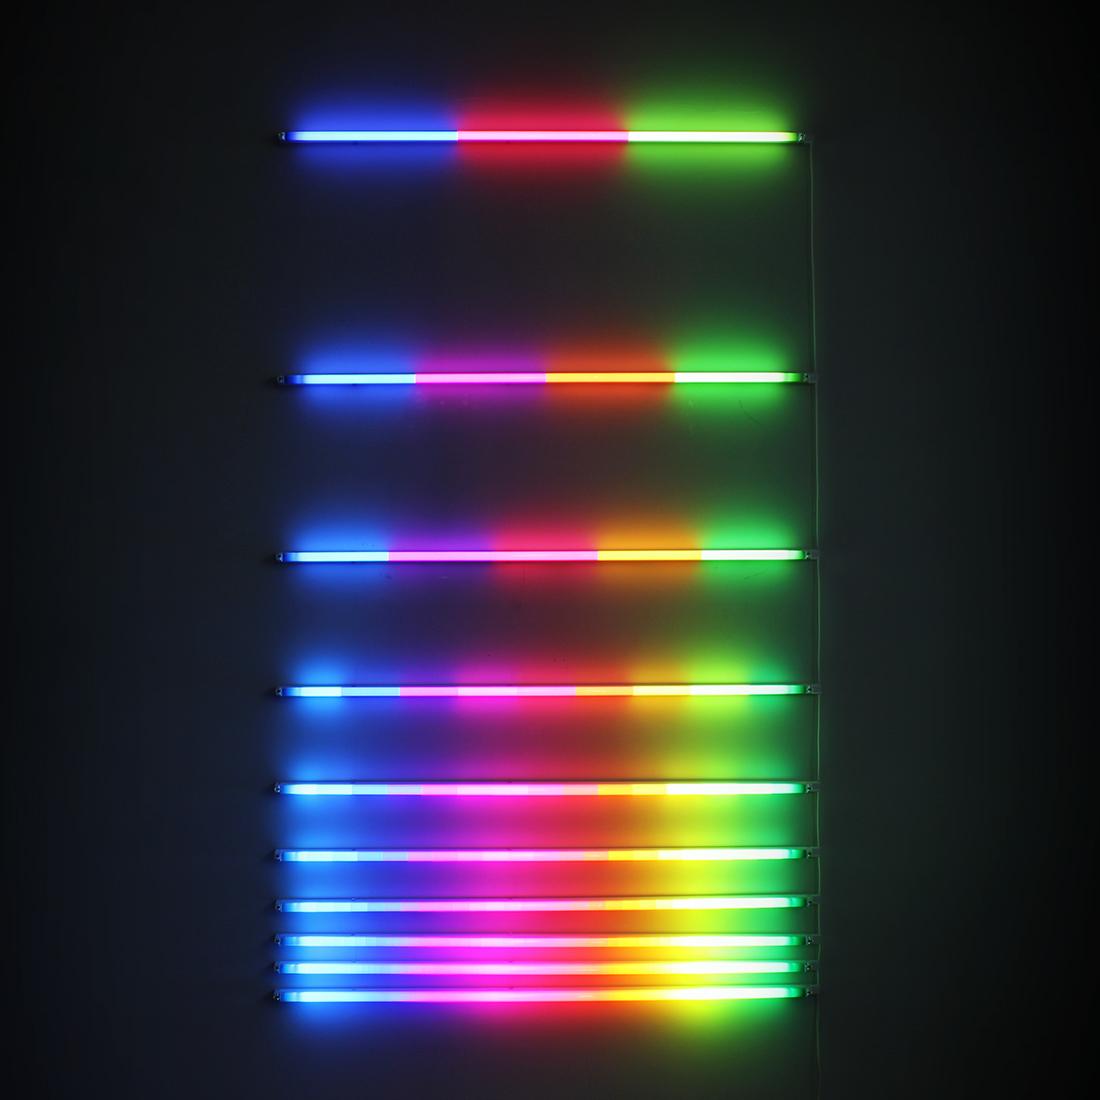 Increasing Resolution (2012), fluorescent lights, filters, 120 x 190 cm